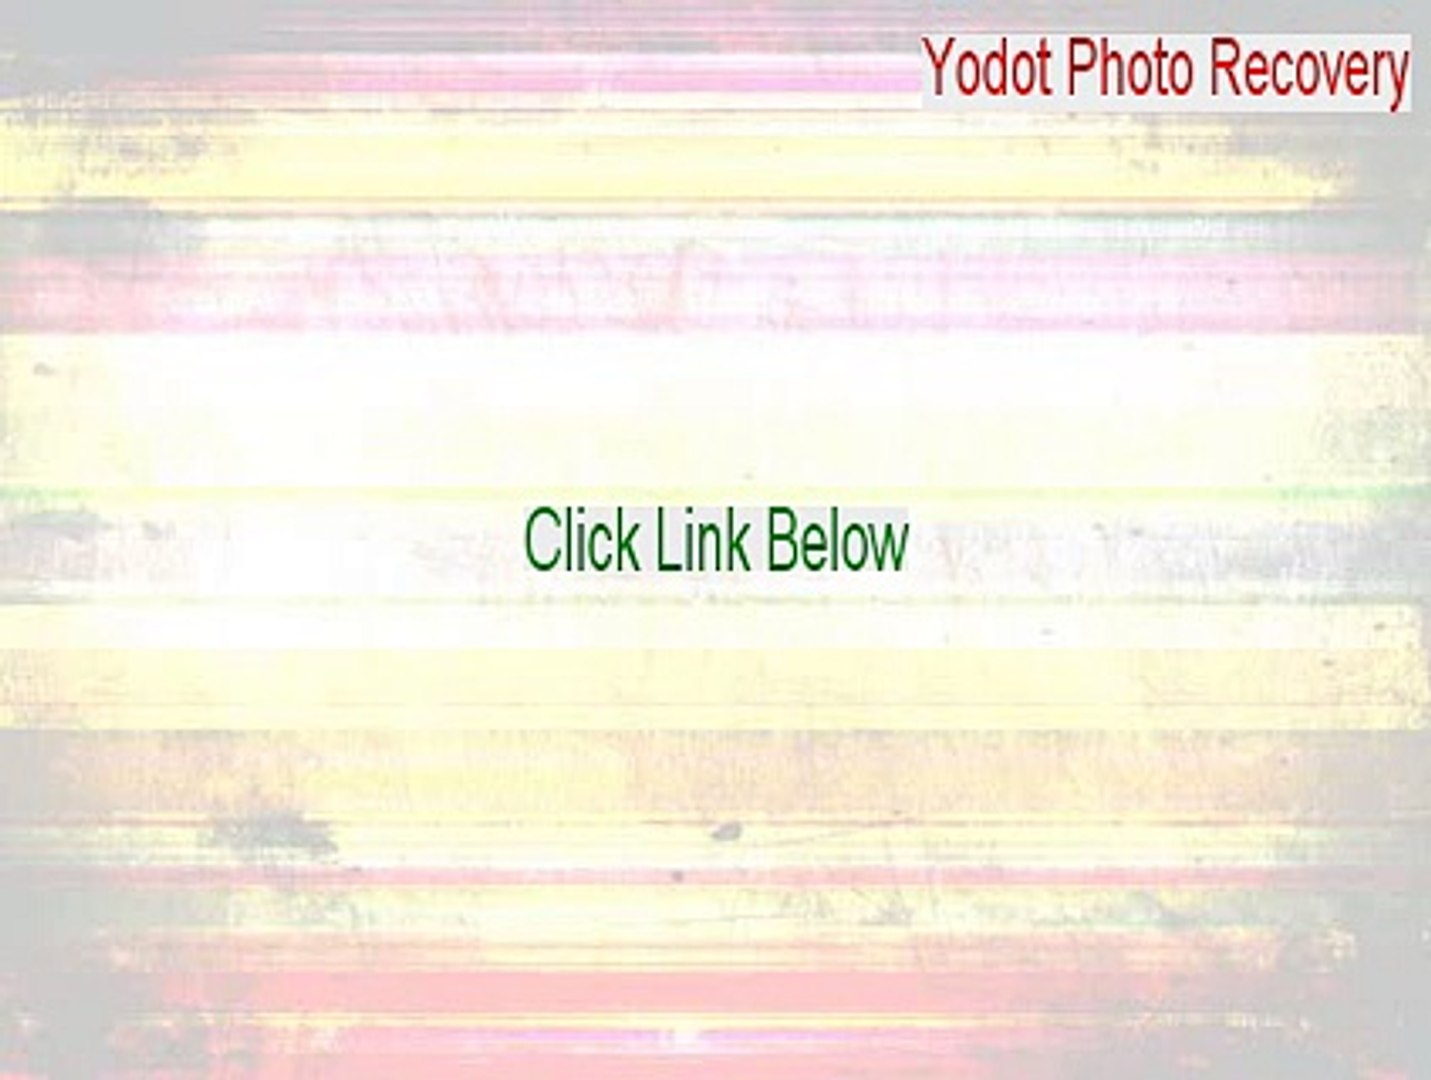 Activation key crack recovery software yodot Yodot Mov